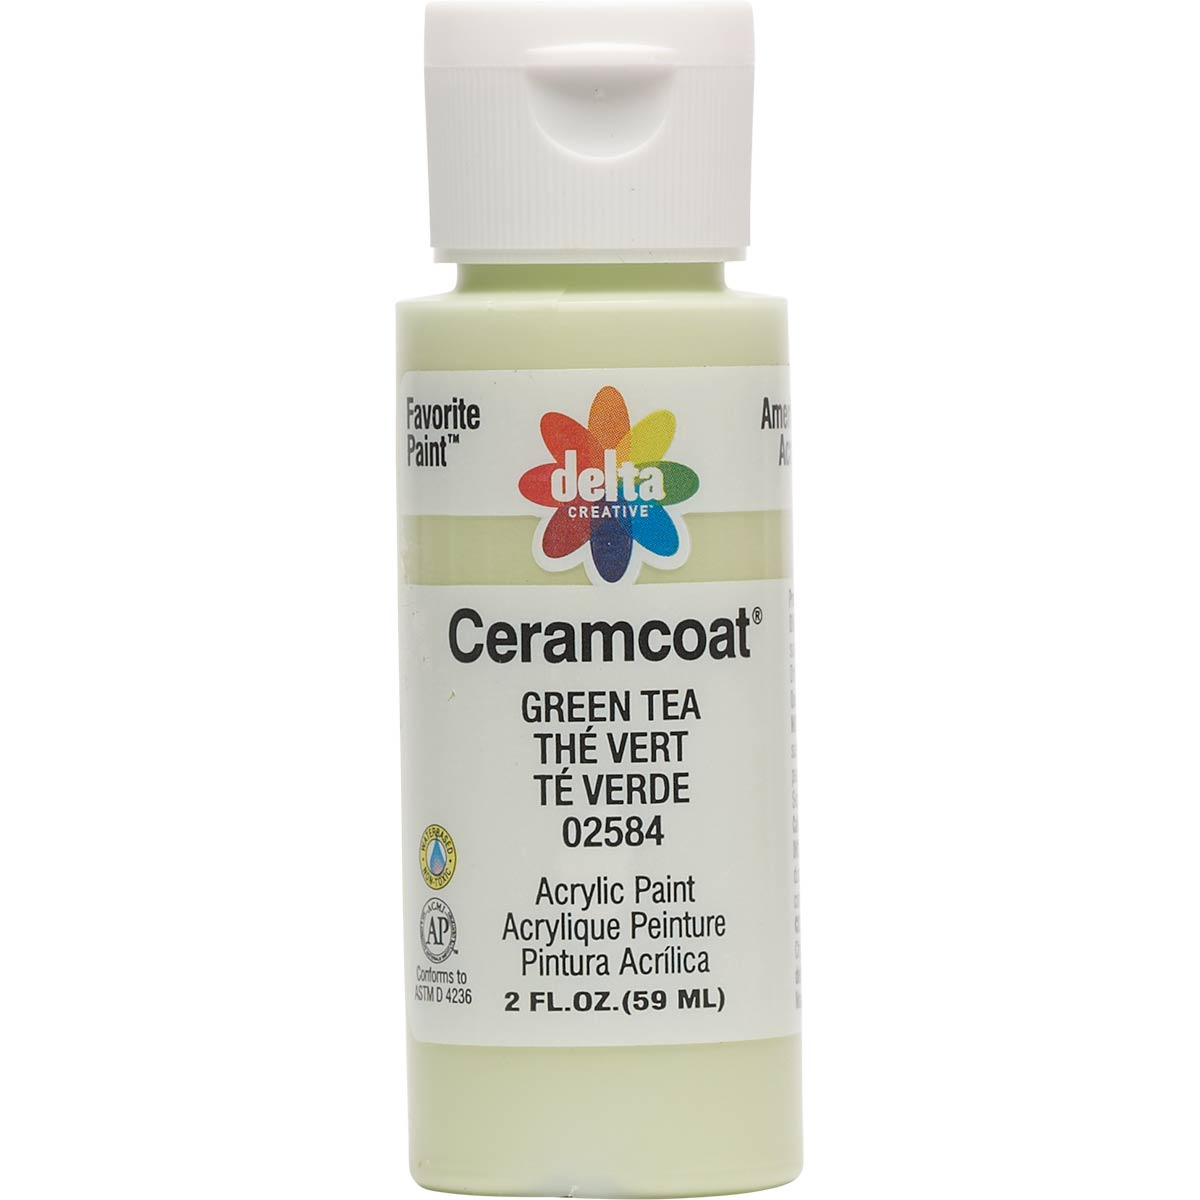 Delta Ceramcoat ® Acrylic Paint - Green Tea, 2 oz. - 025840202W